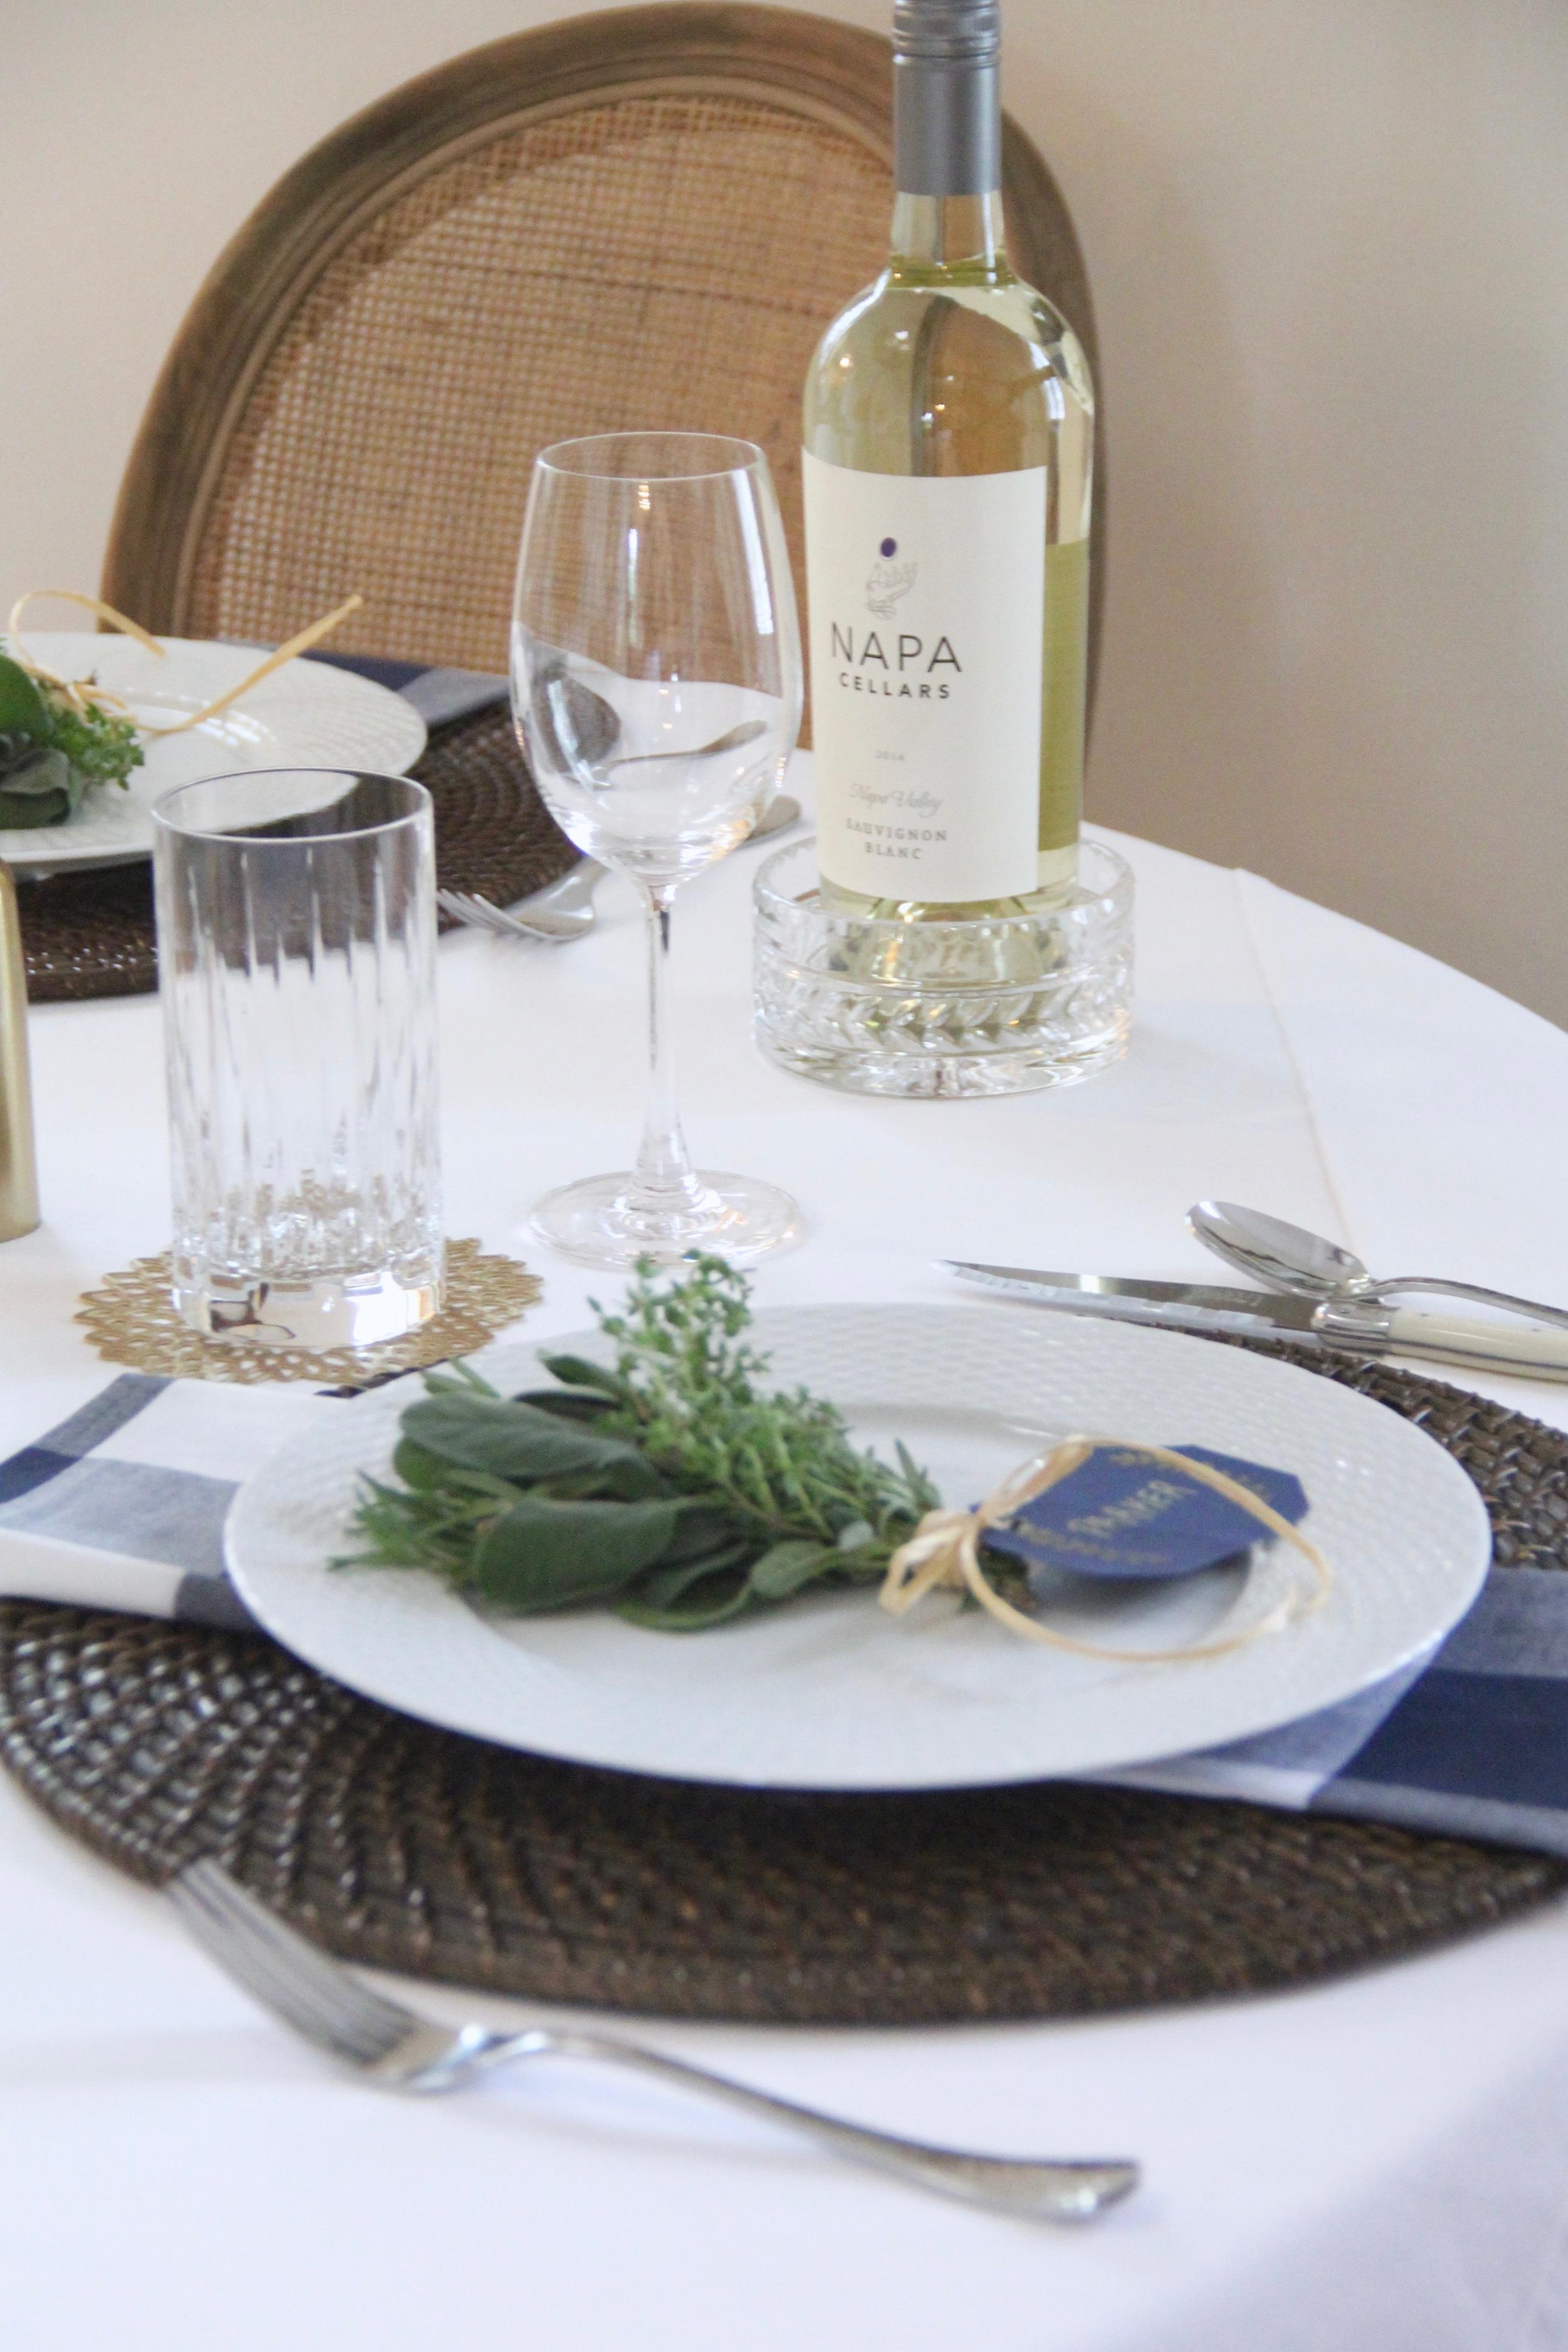 Napa Cellars Sauvignon Blanc.jpg